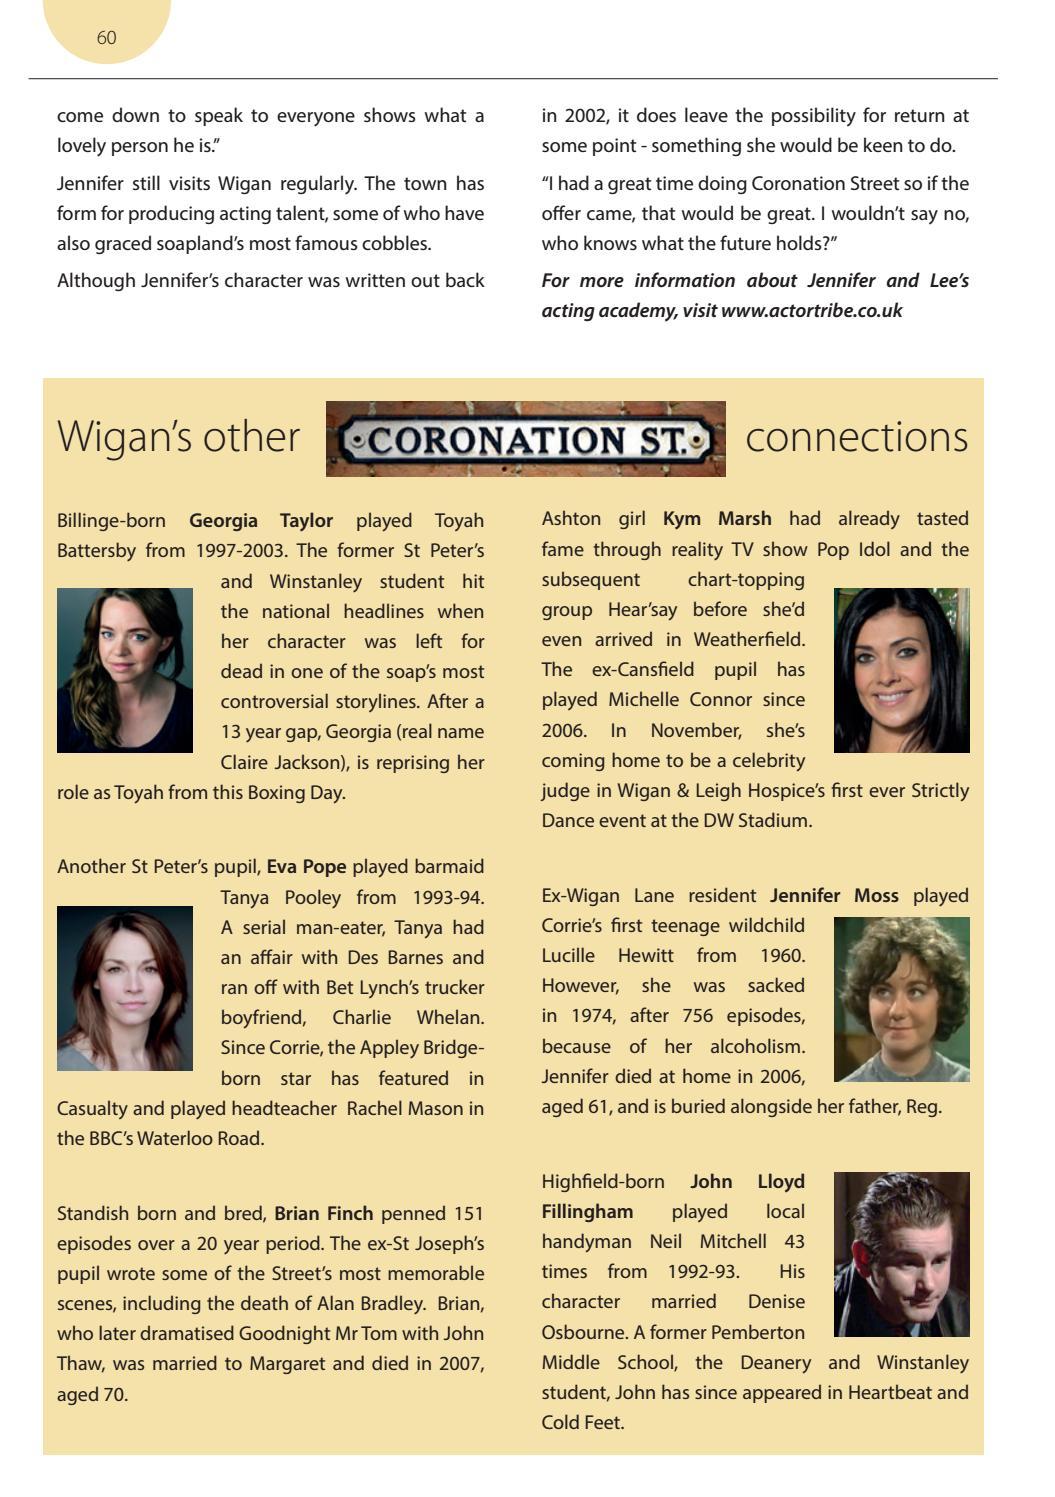 Local Life - Wigan - November 2016 by Local Life 247 Ltd - issuu